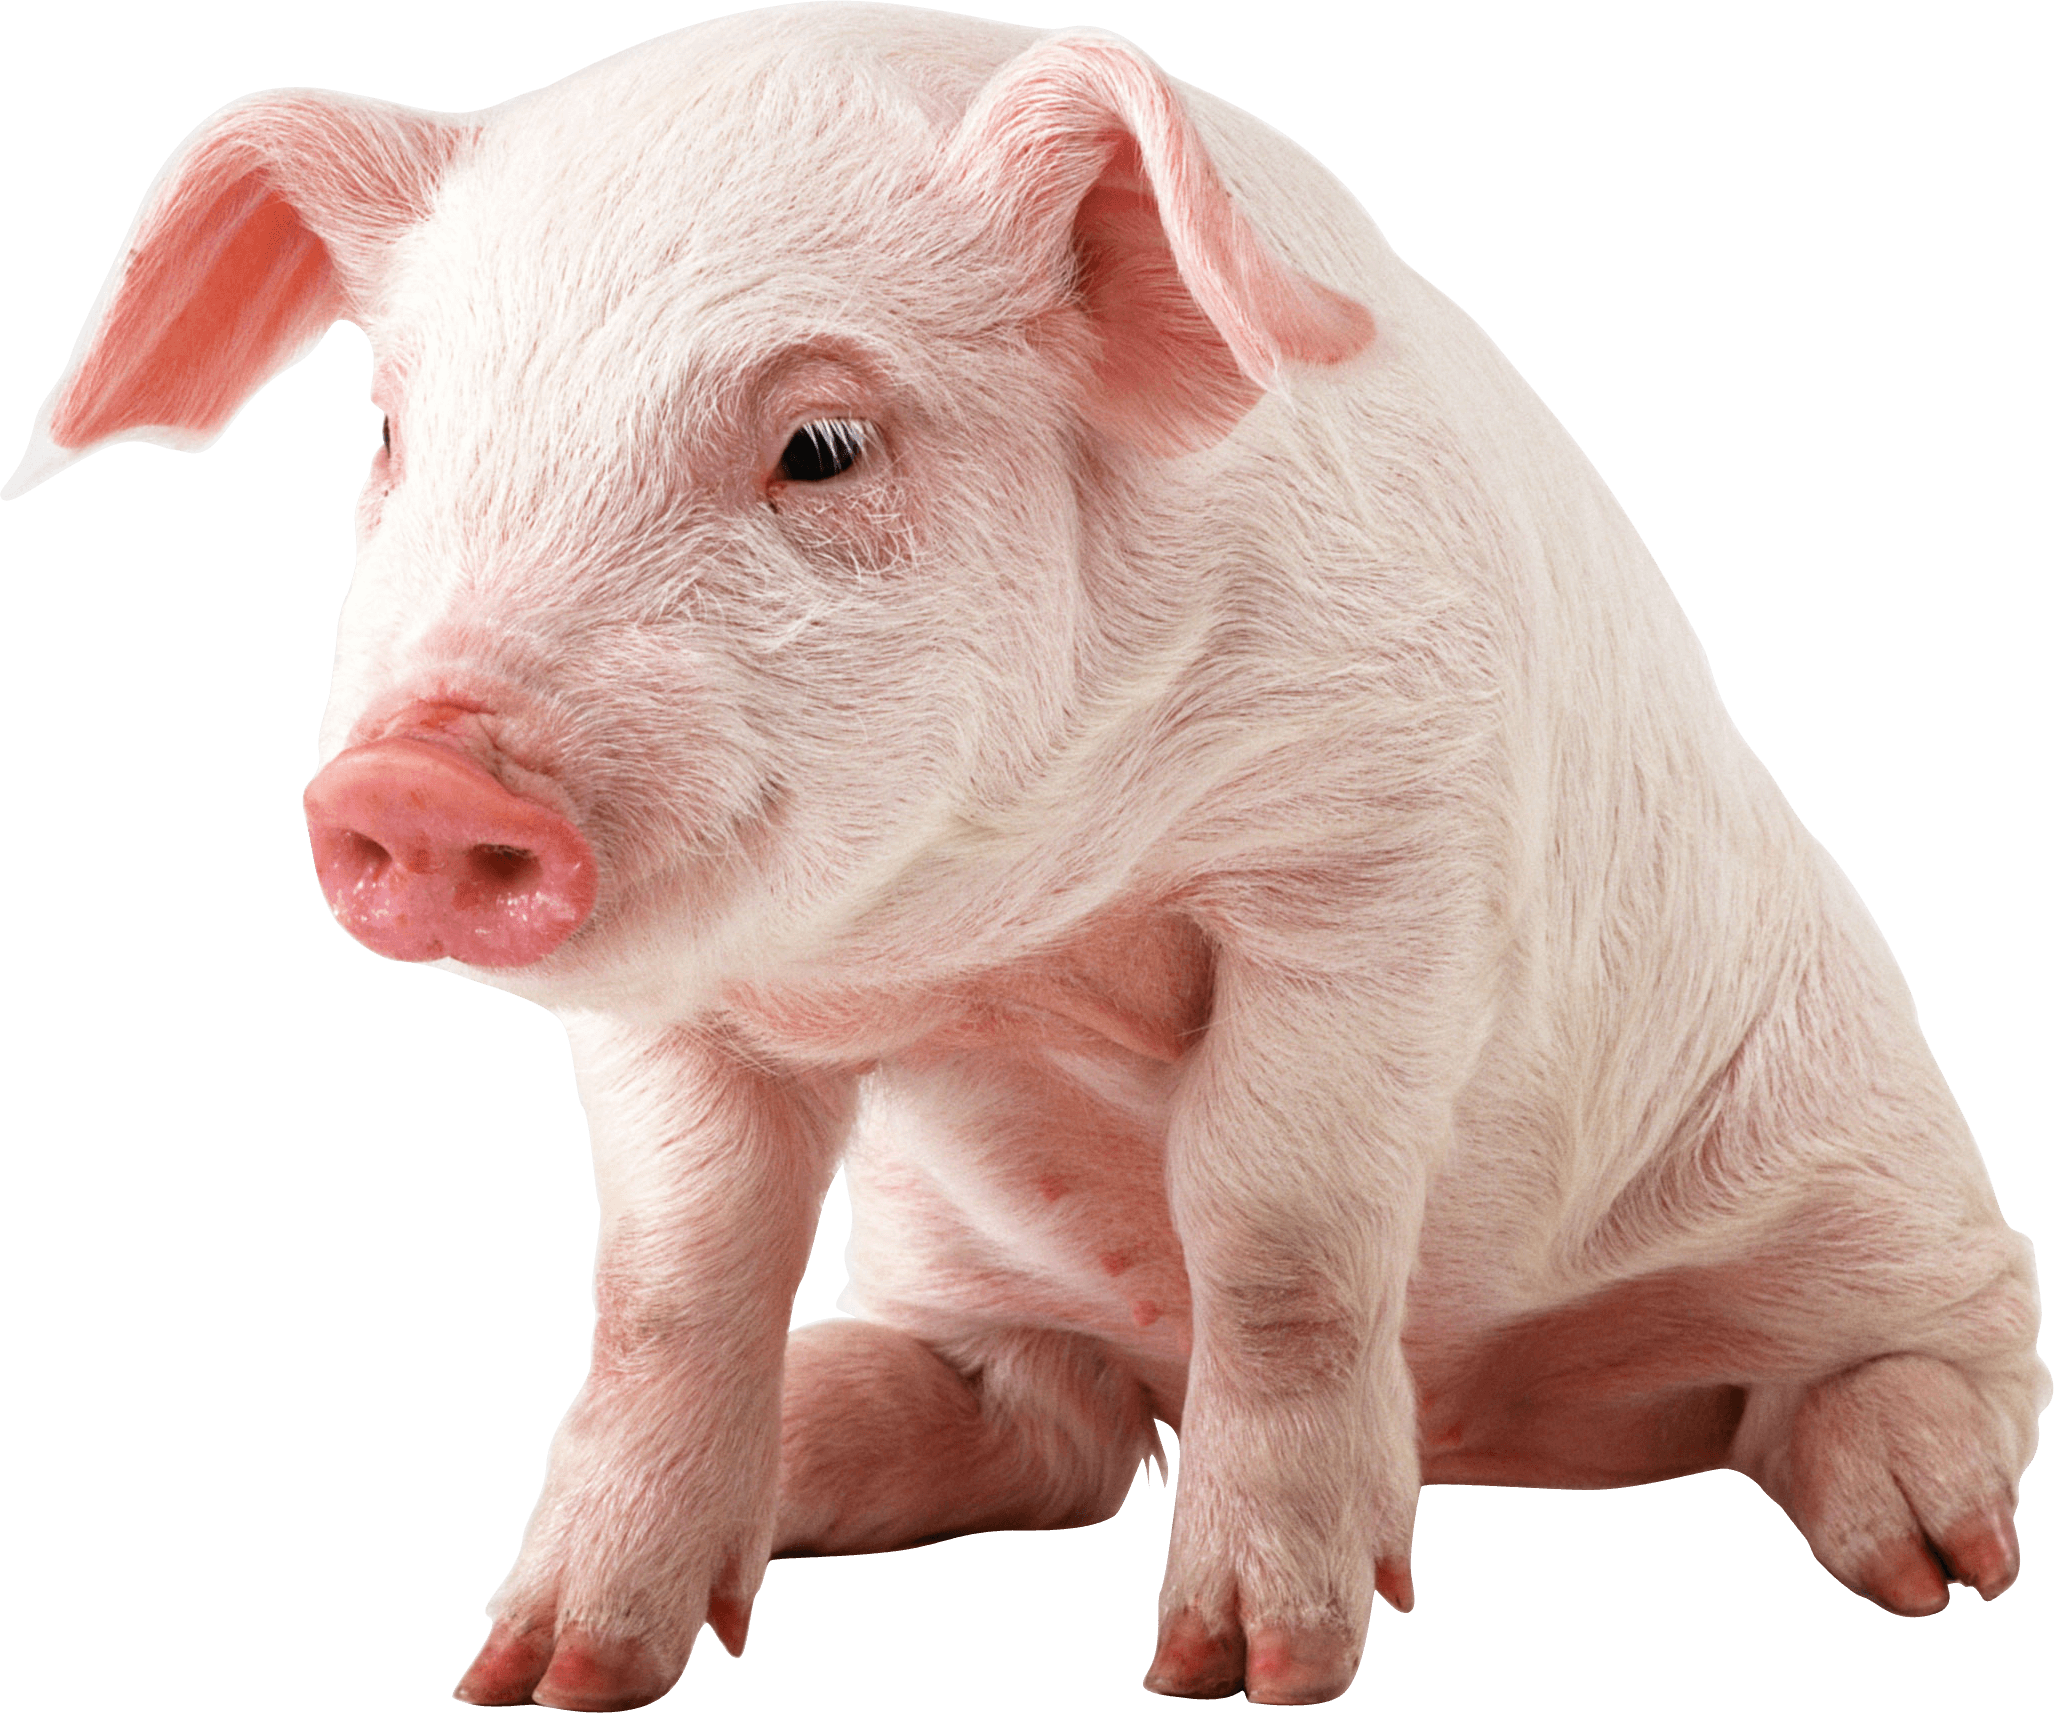 Kawaii Cute Pigs Wallpapers Top Free Kawaii Cute Pigs Backgrounds Wallpaperaccess